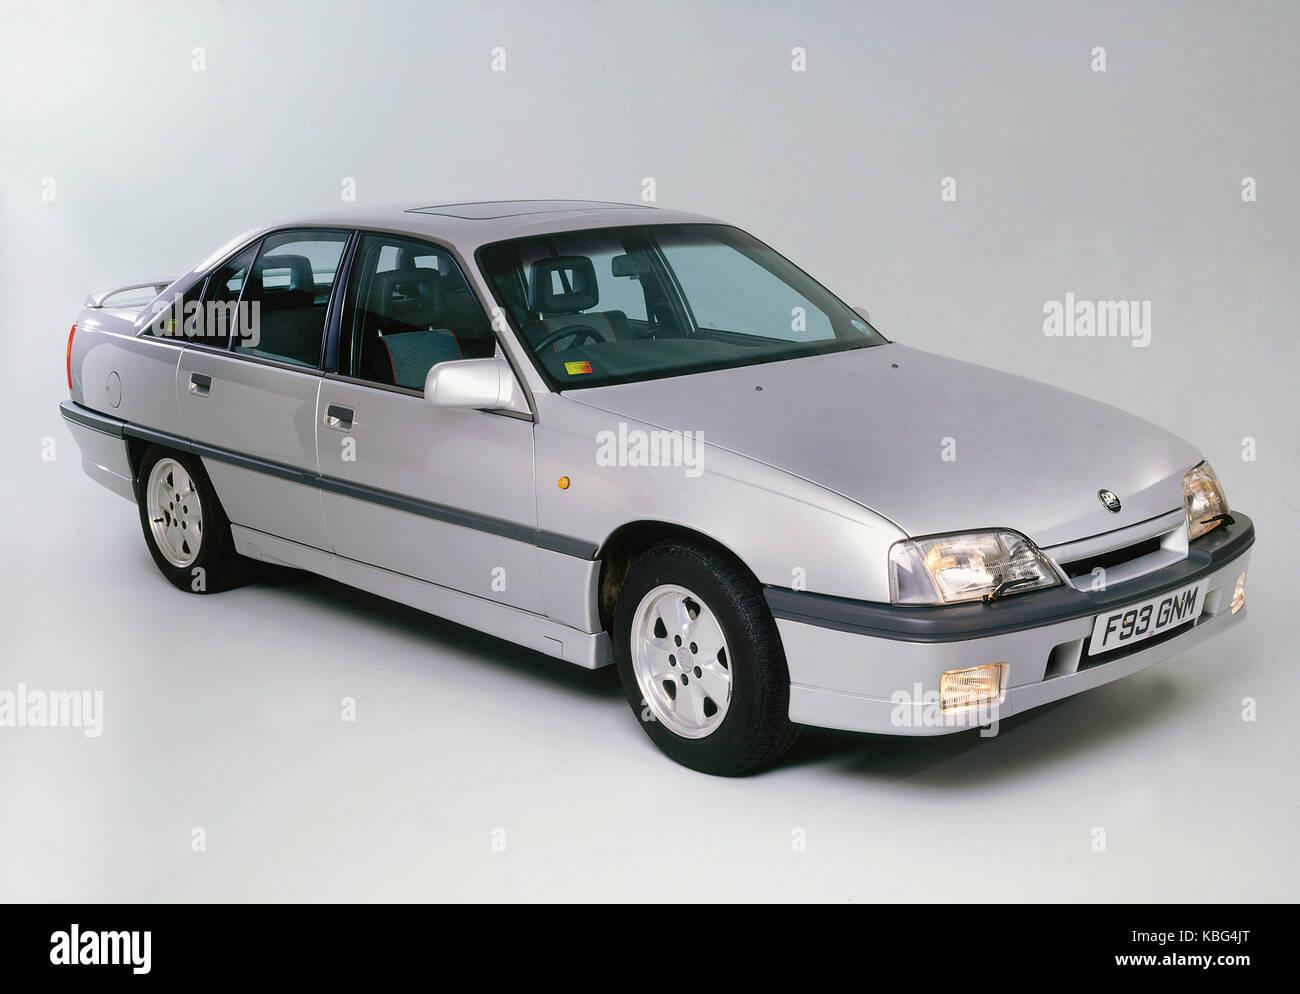 1989 Vauxhall Carlton 3.0 GSi Imagen De Stock